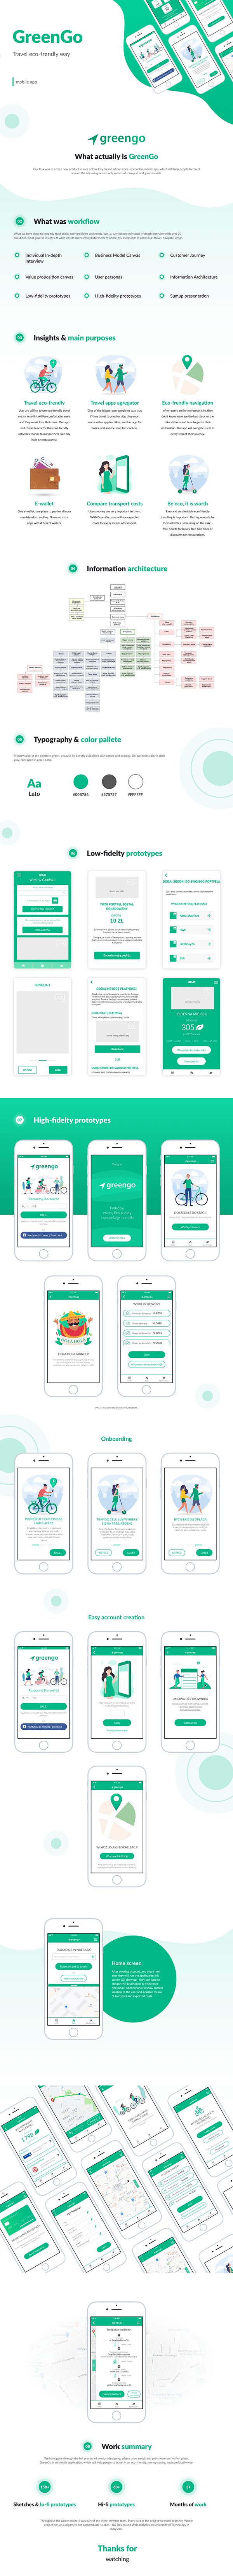 GreenGo - Travel eco-friendly way mobile app